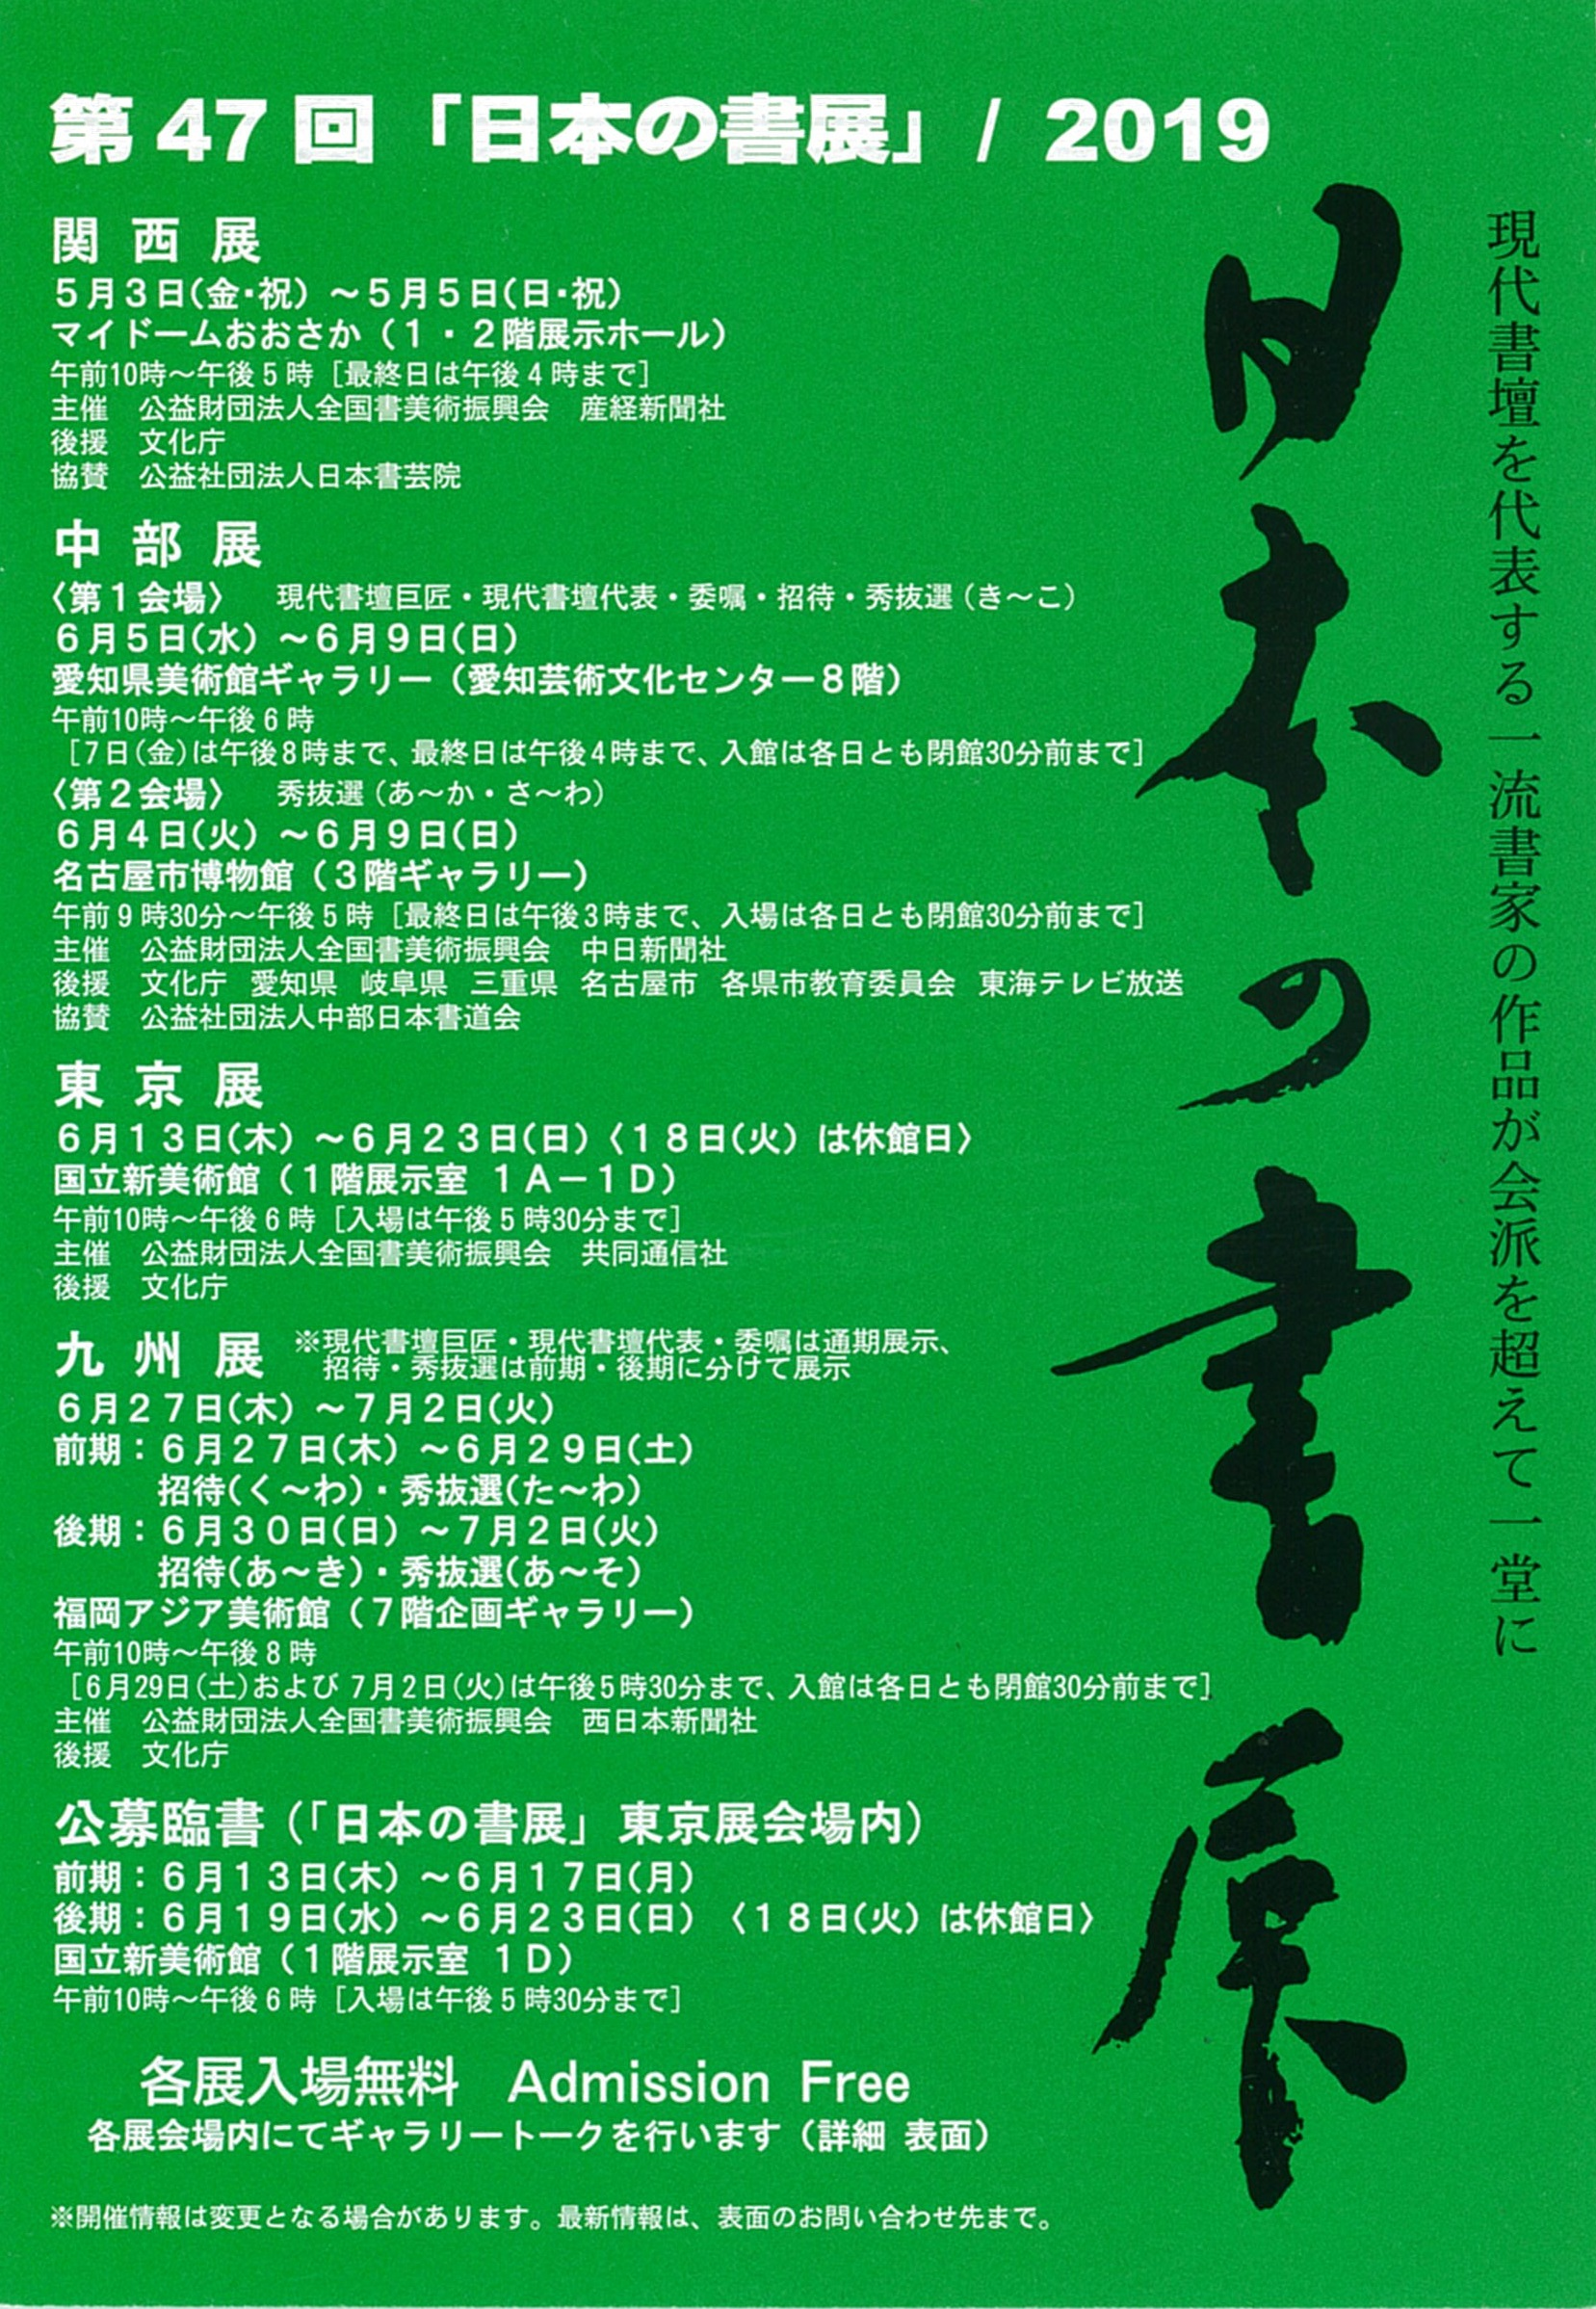 https://garyukai.jp/wp/wp-content/uploads/2019/05/20190405154415-0001.jpg